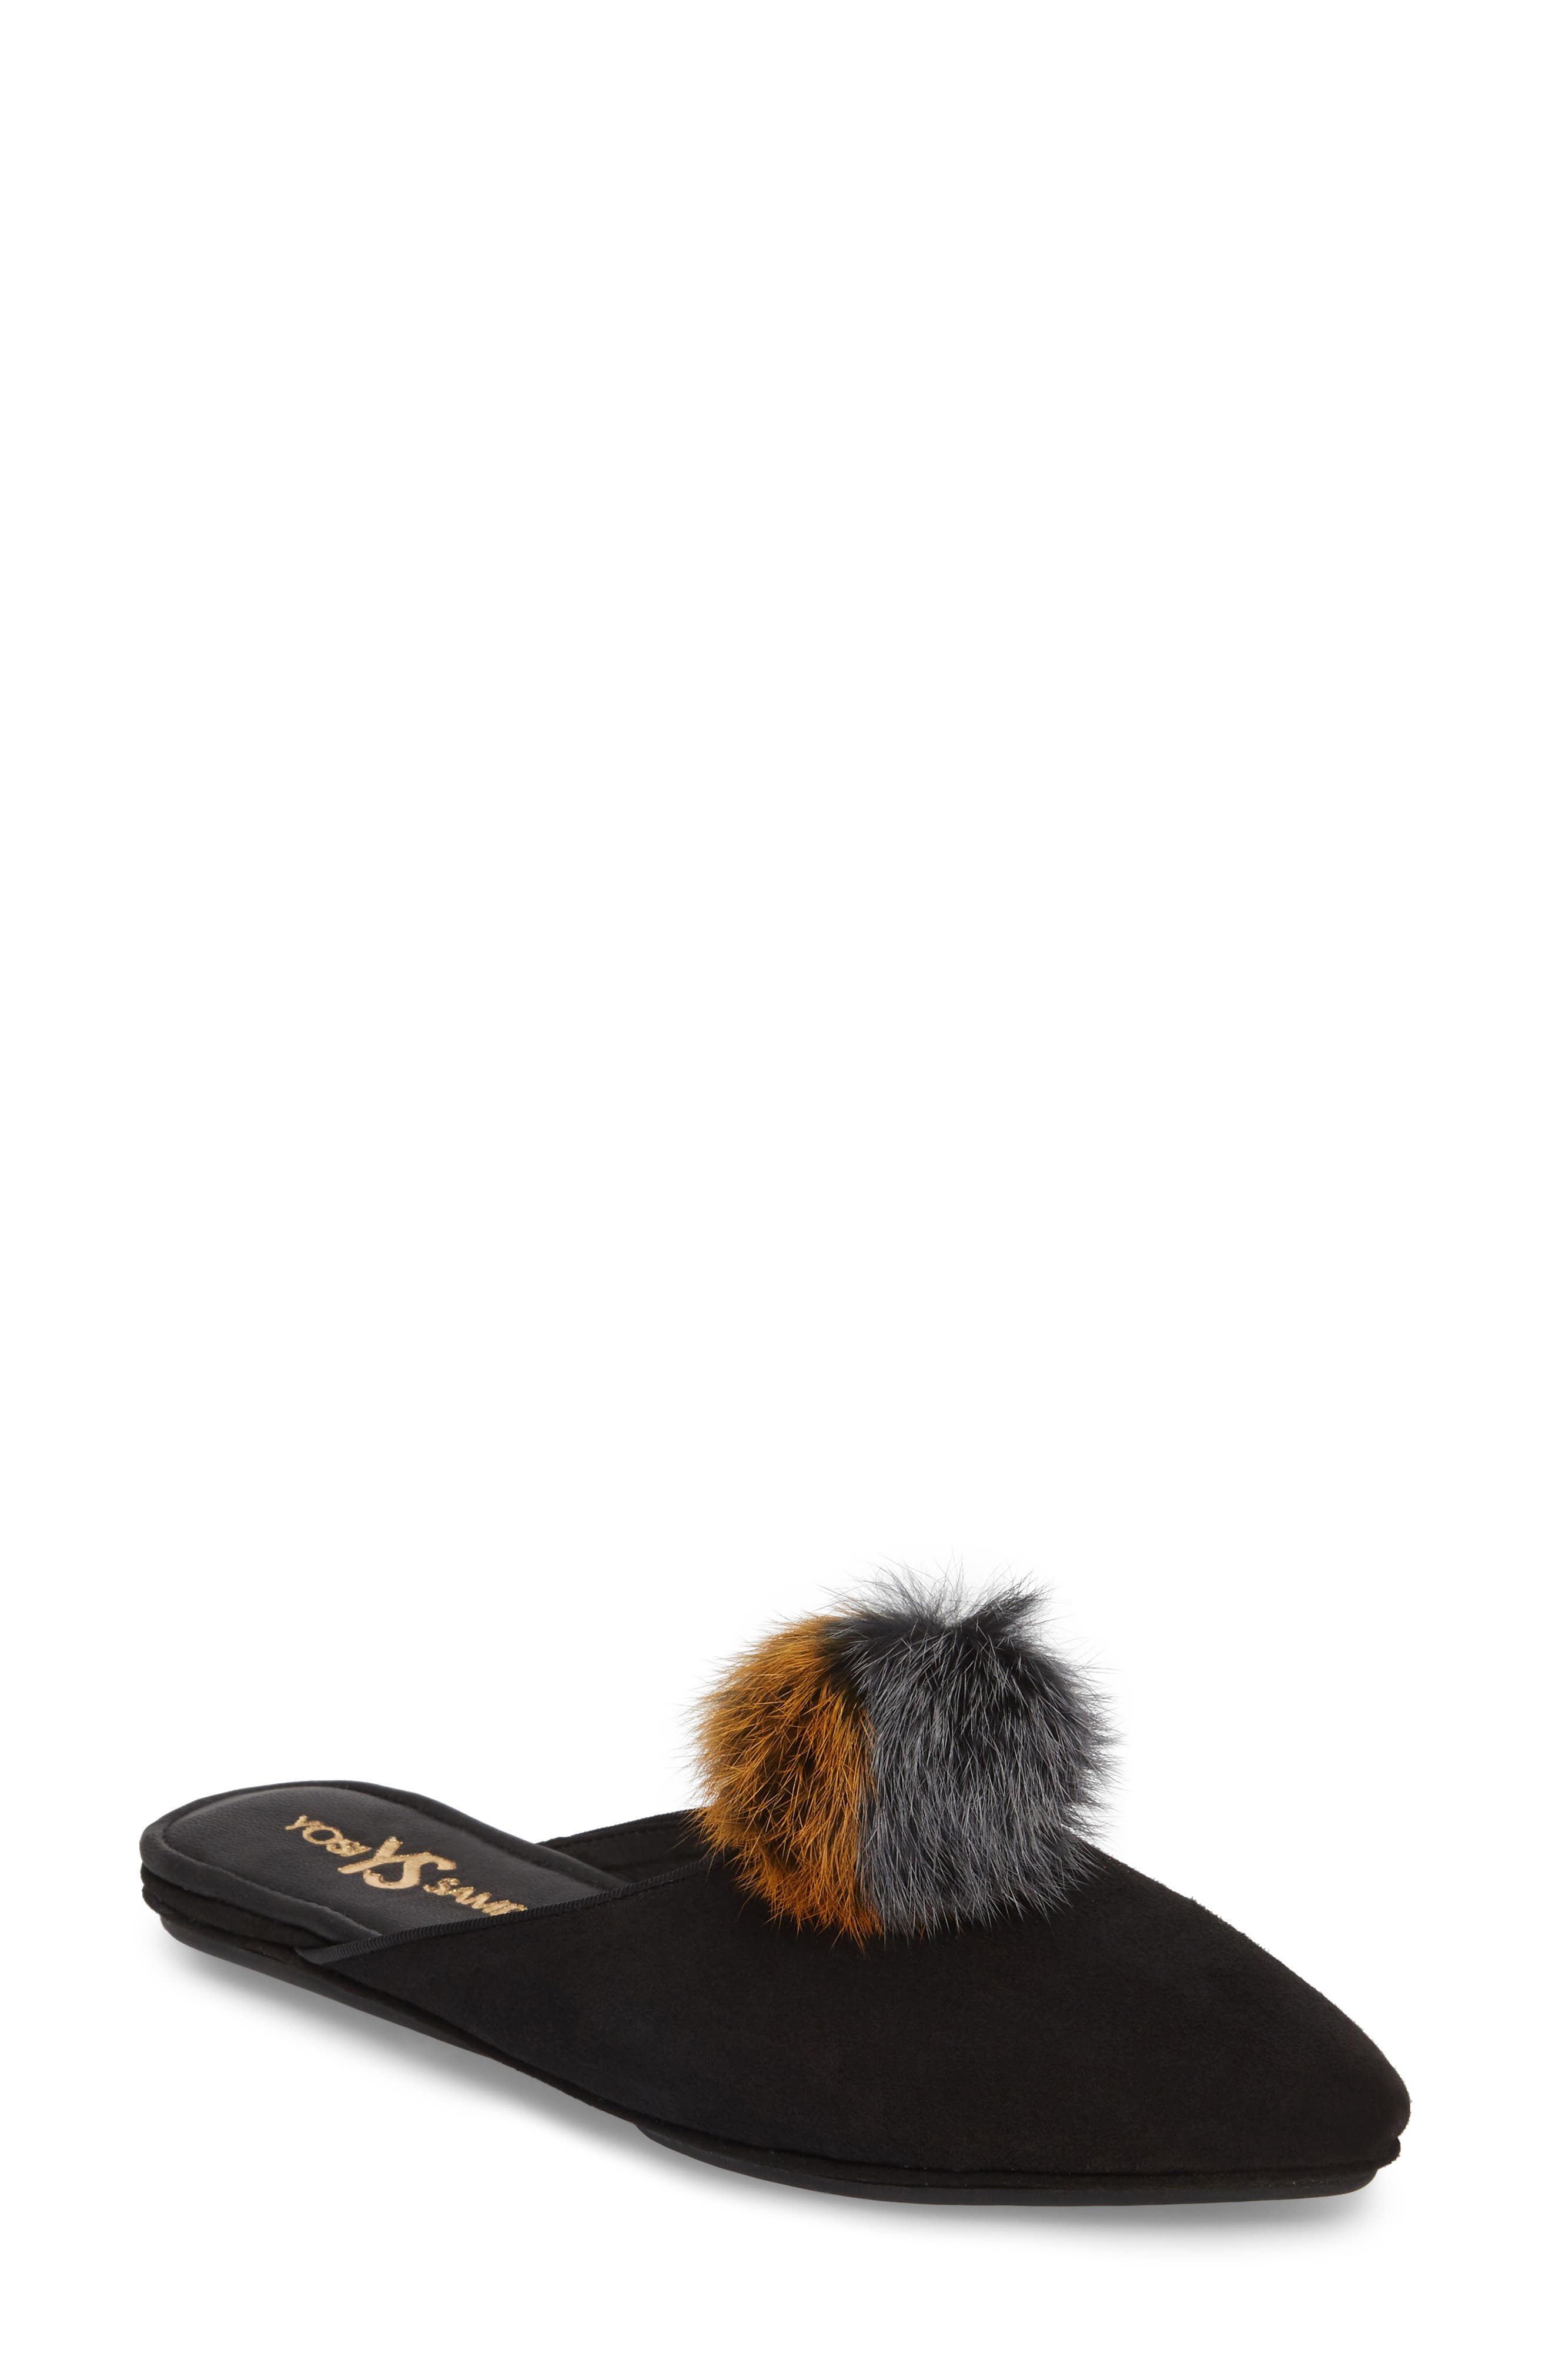 Vidi Genuine Rabbit Fur Loafer Mule,                         Main,                         color, Black Rabbit Fur